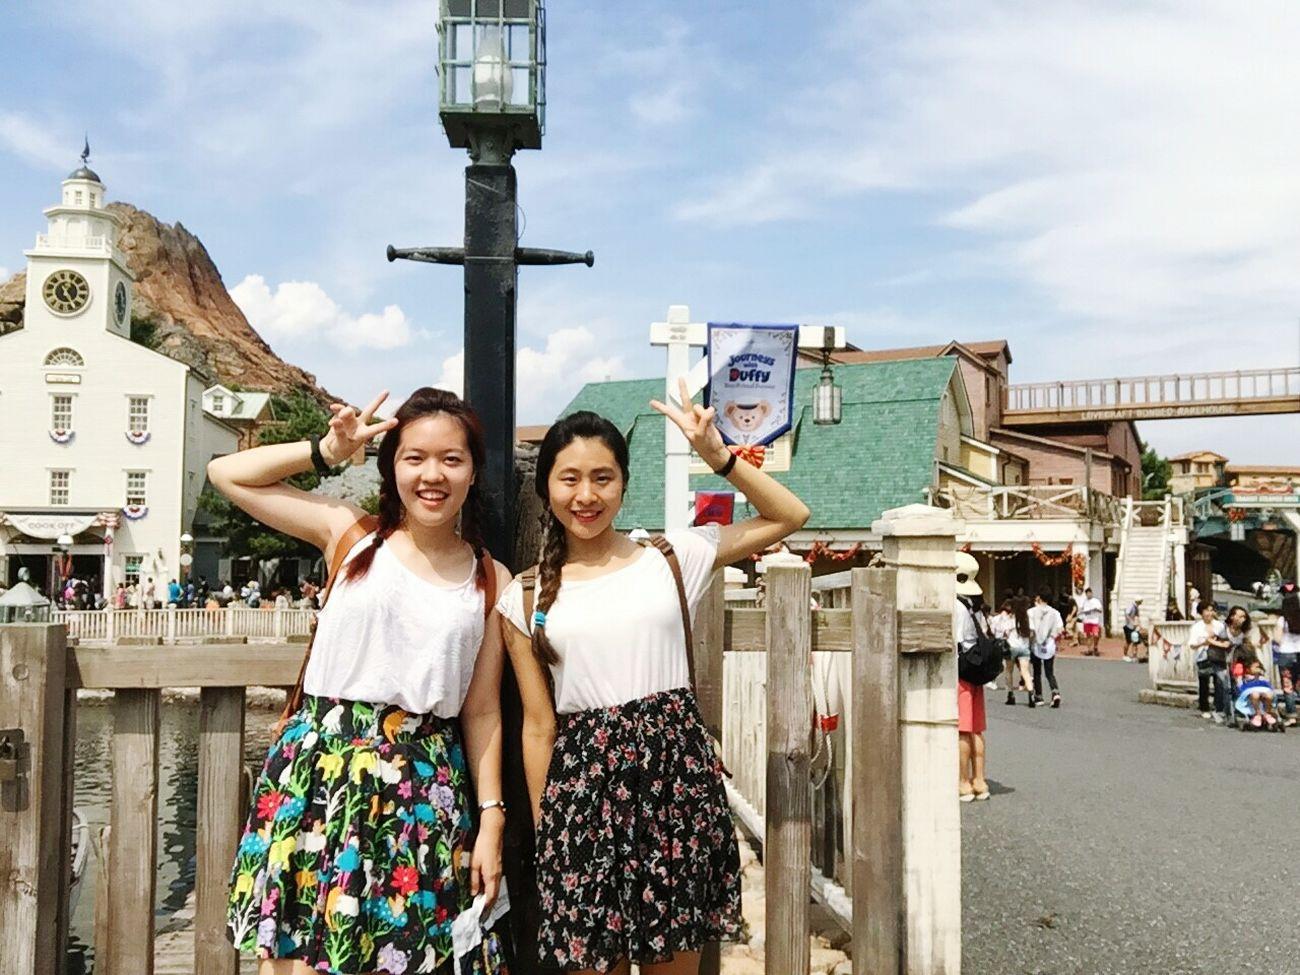 Selfies Everywhere DisneySea Duffy Chiba Tokyo Japan